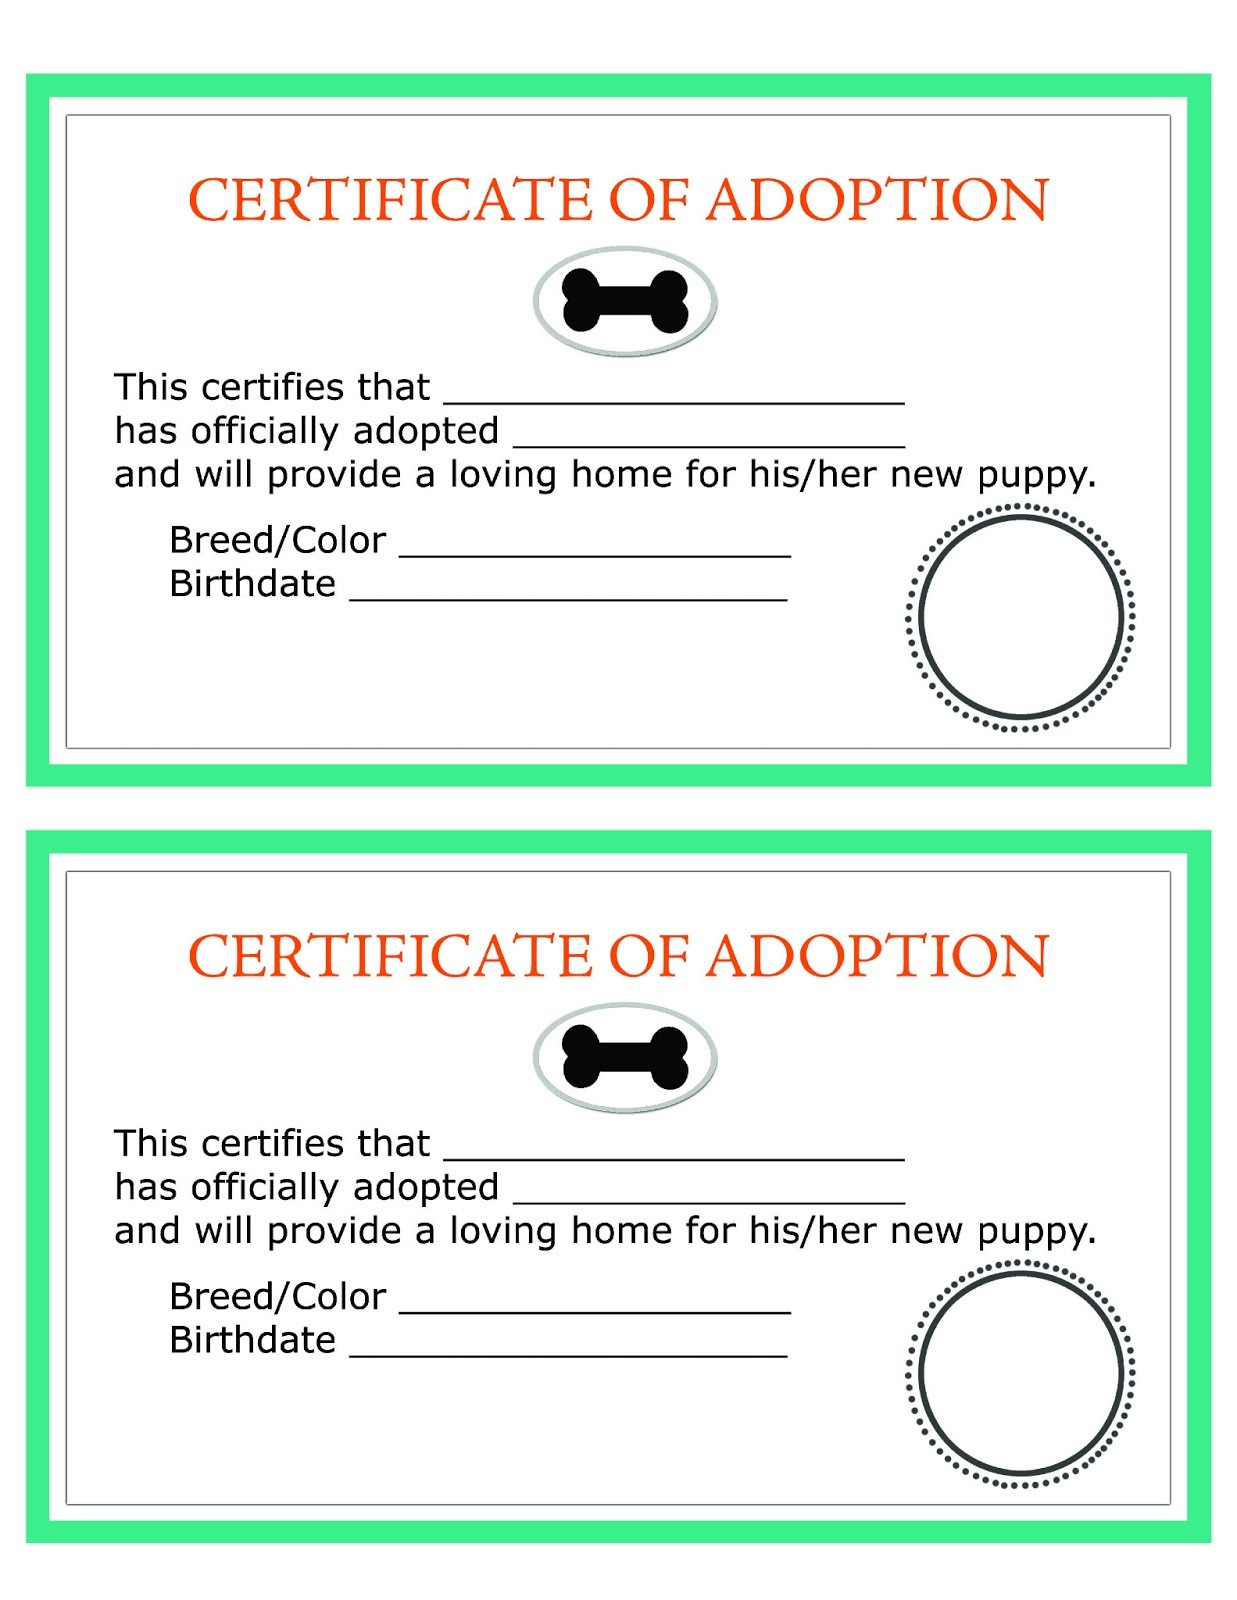 Printable Dog Birth Certificate Fresh Child Adoption Certificate - Free Printable Adoption Certificate